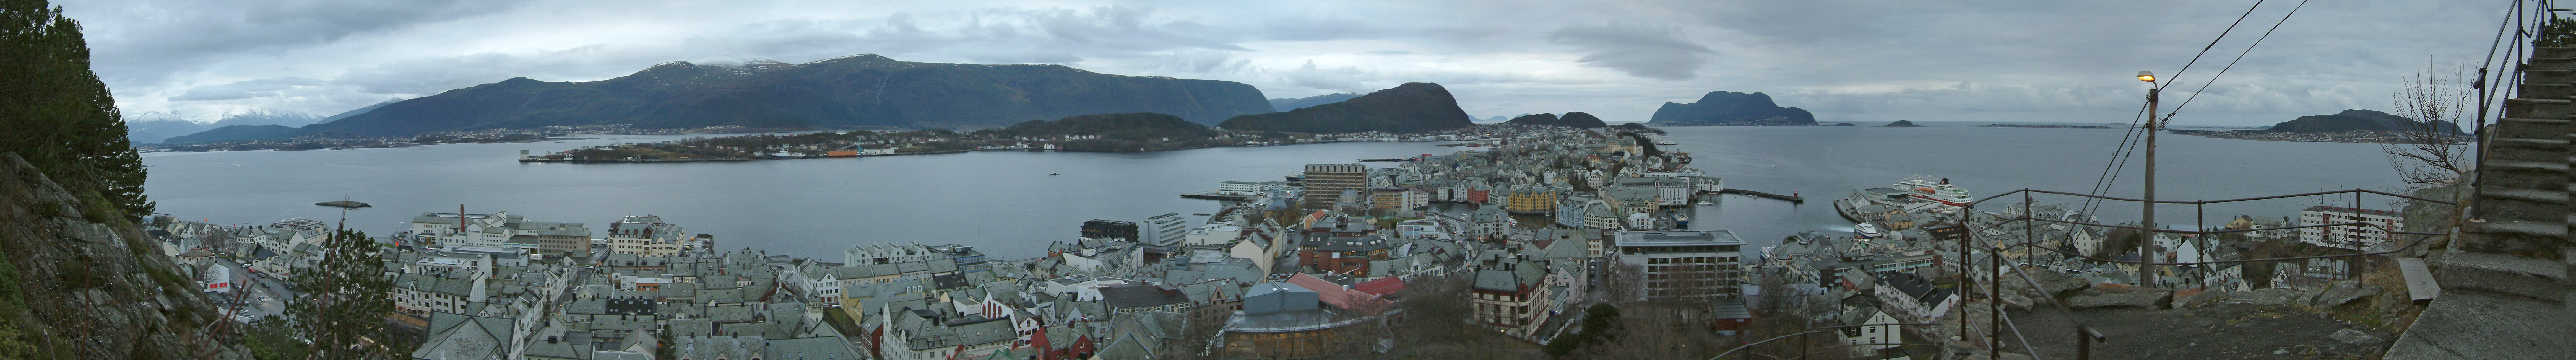 Alesund Norway - Panoramic View